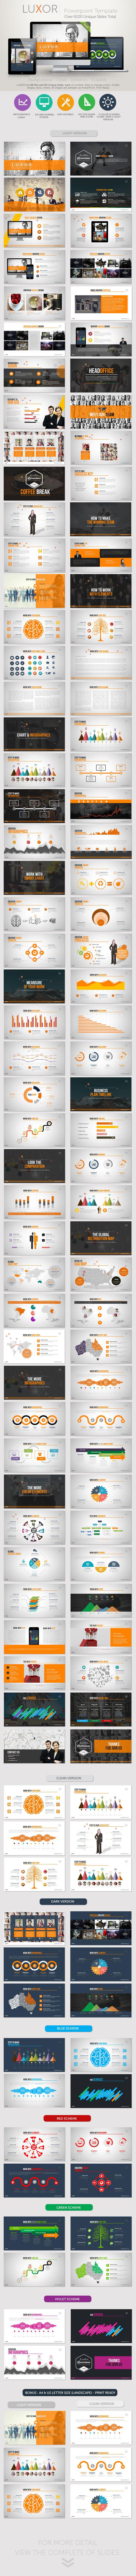 Luxor PowerPoint Presentation Template  - Business PowerPoint Templates